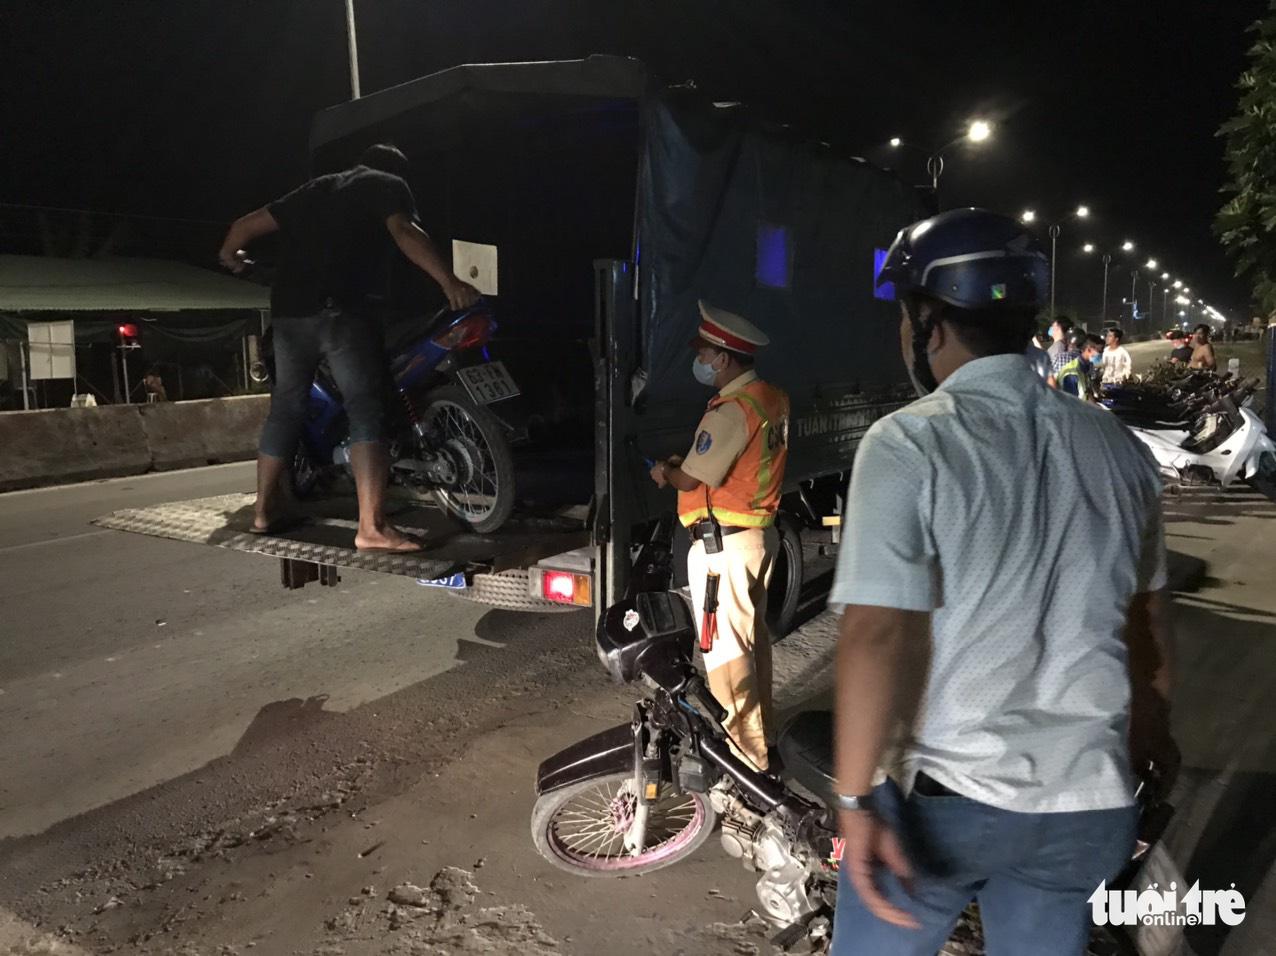 Policeman suffers brain hemorrhage, broken leg after being hit by street racer in Vietnam